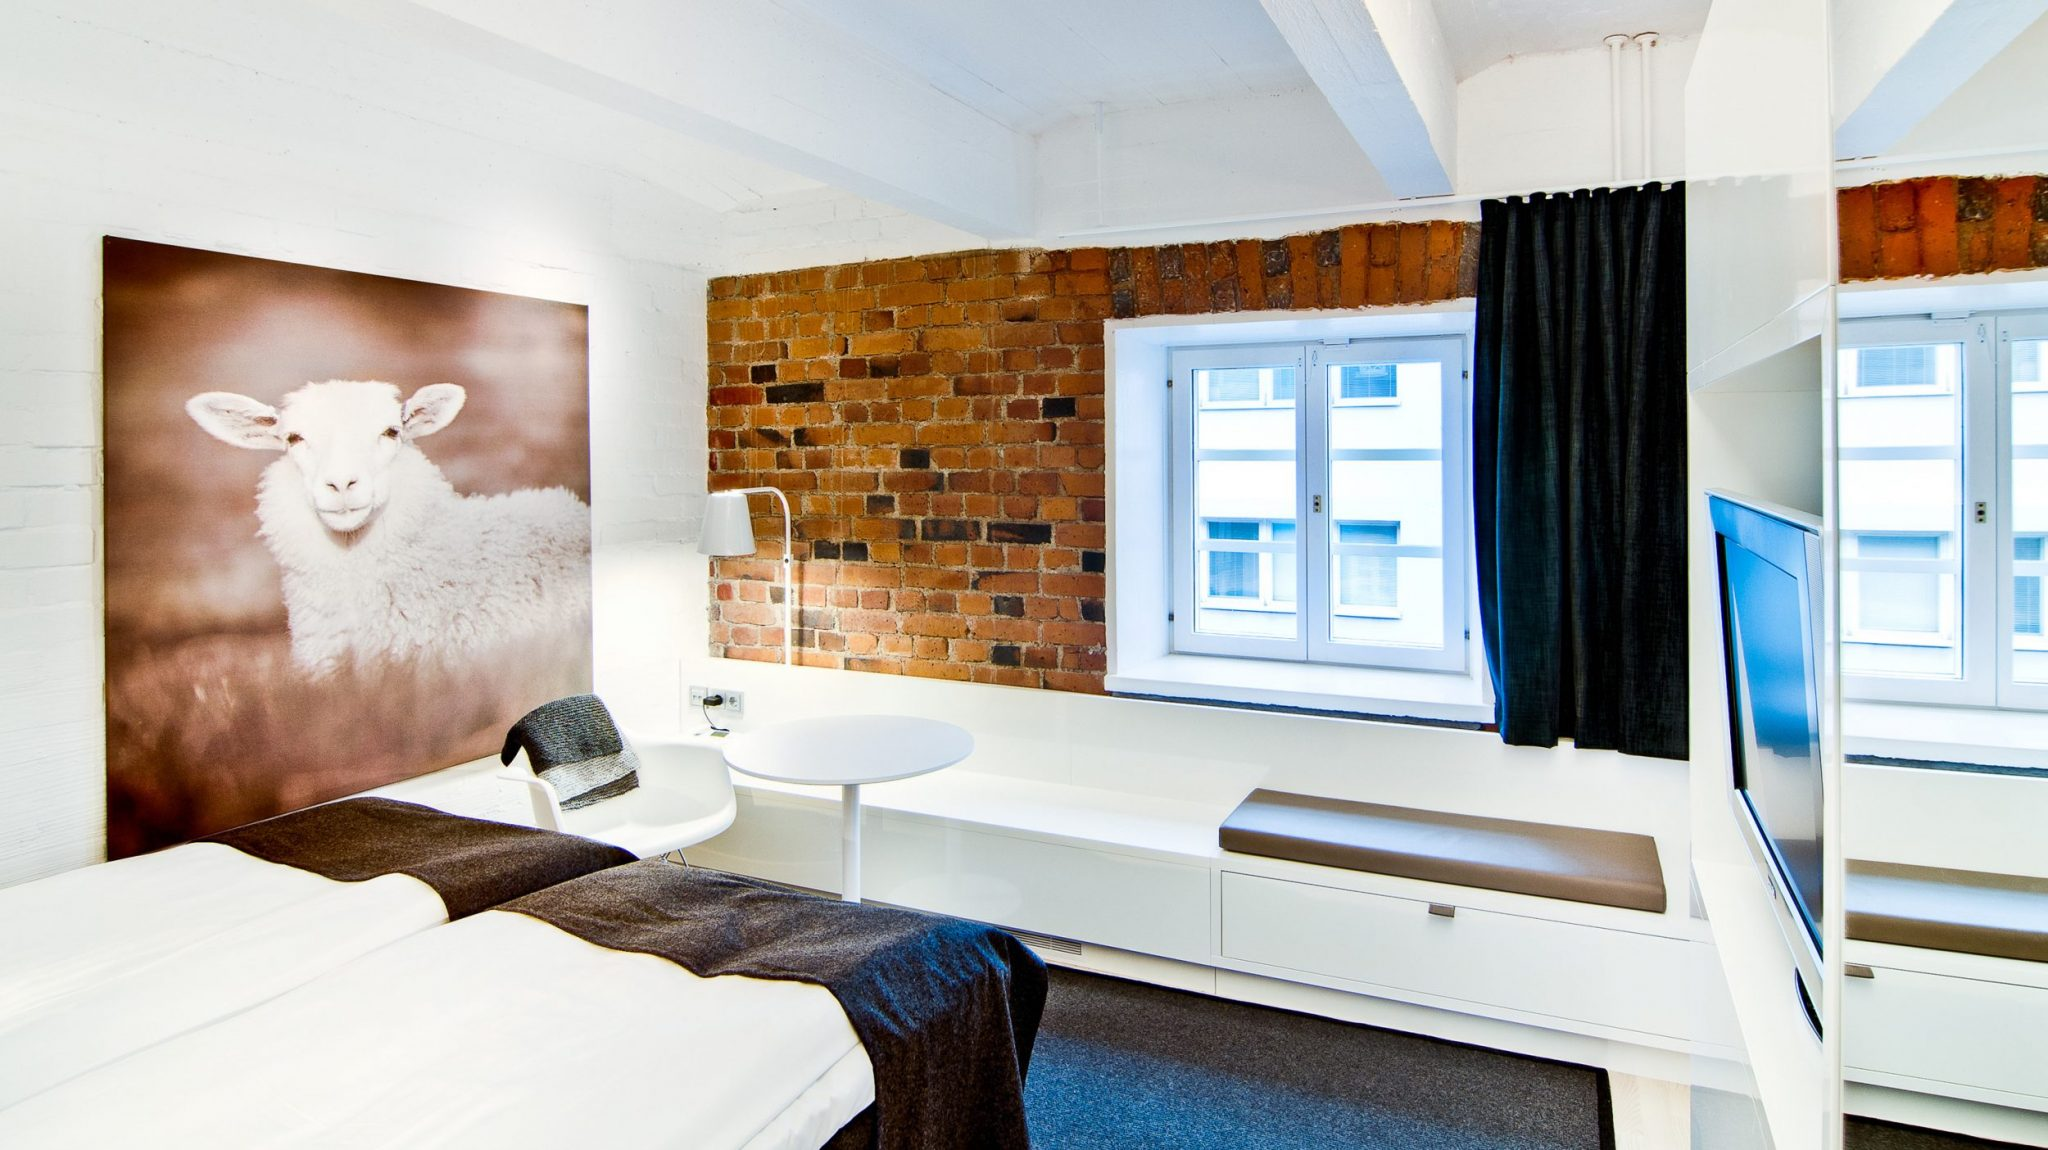 Sokos_Hotel_Villa_Tampere_GI_project-16